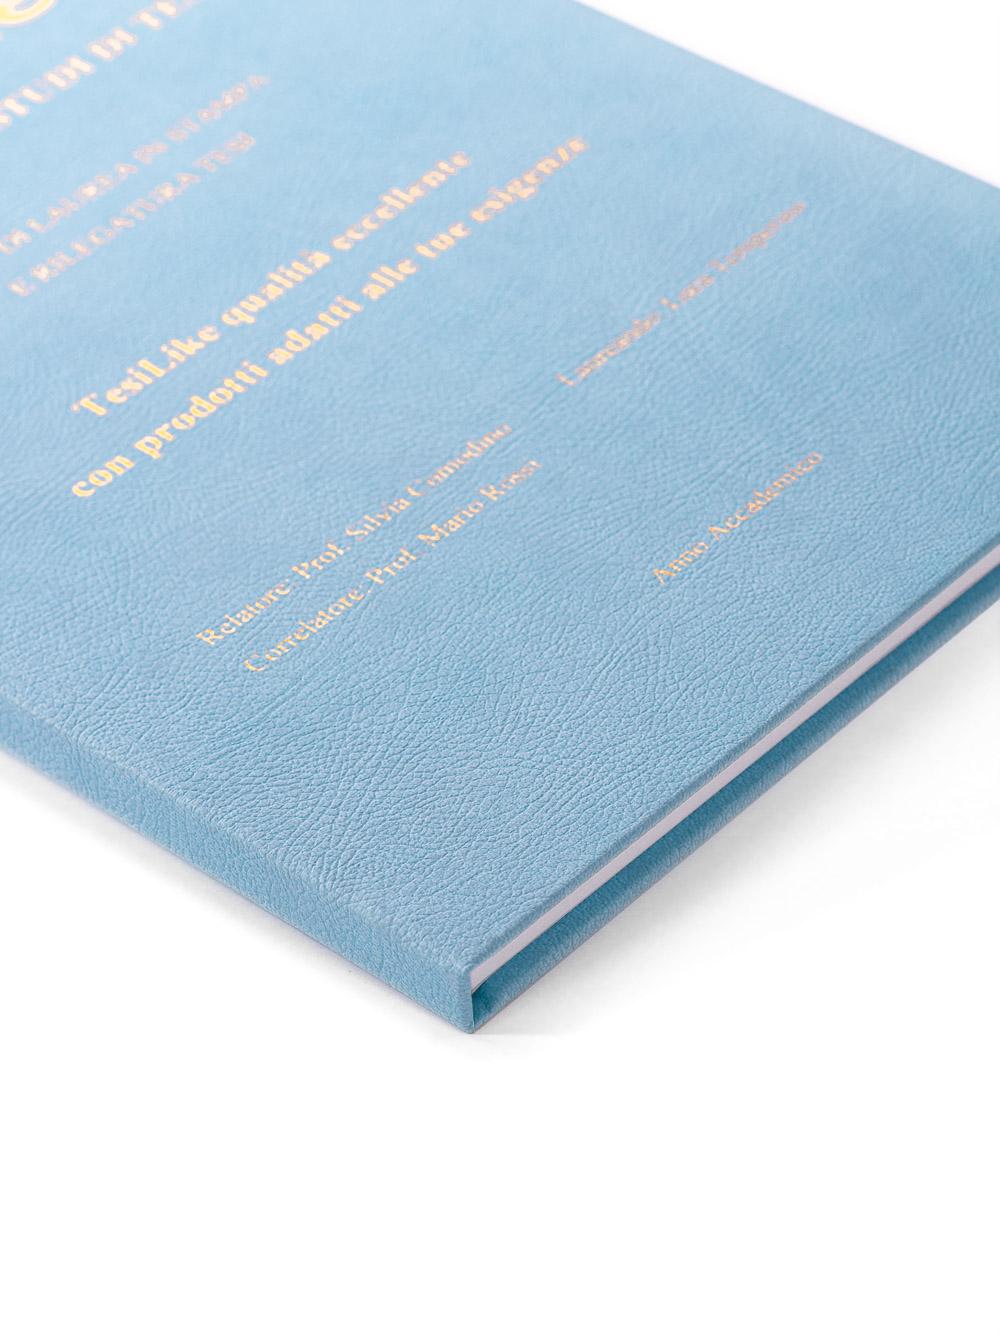 copertina-tesi-rigida-morbida-azzurro-frontespizio-bronzo-dettaglio-tesilike